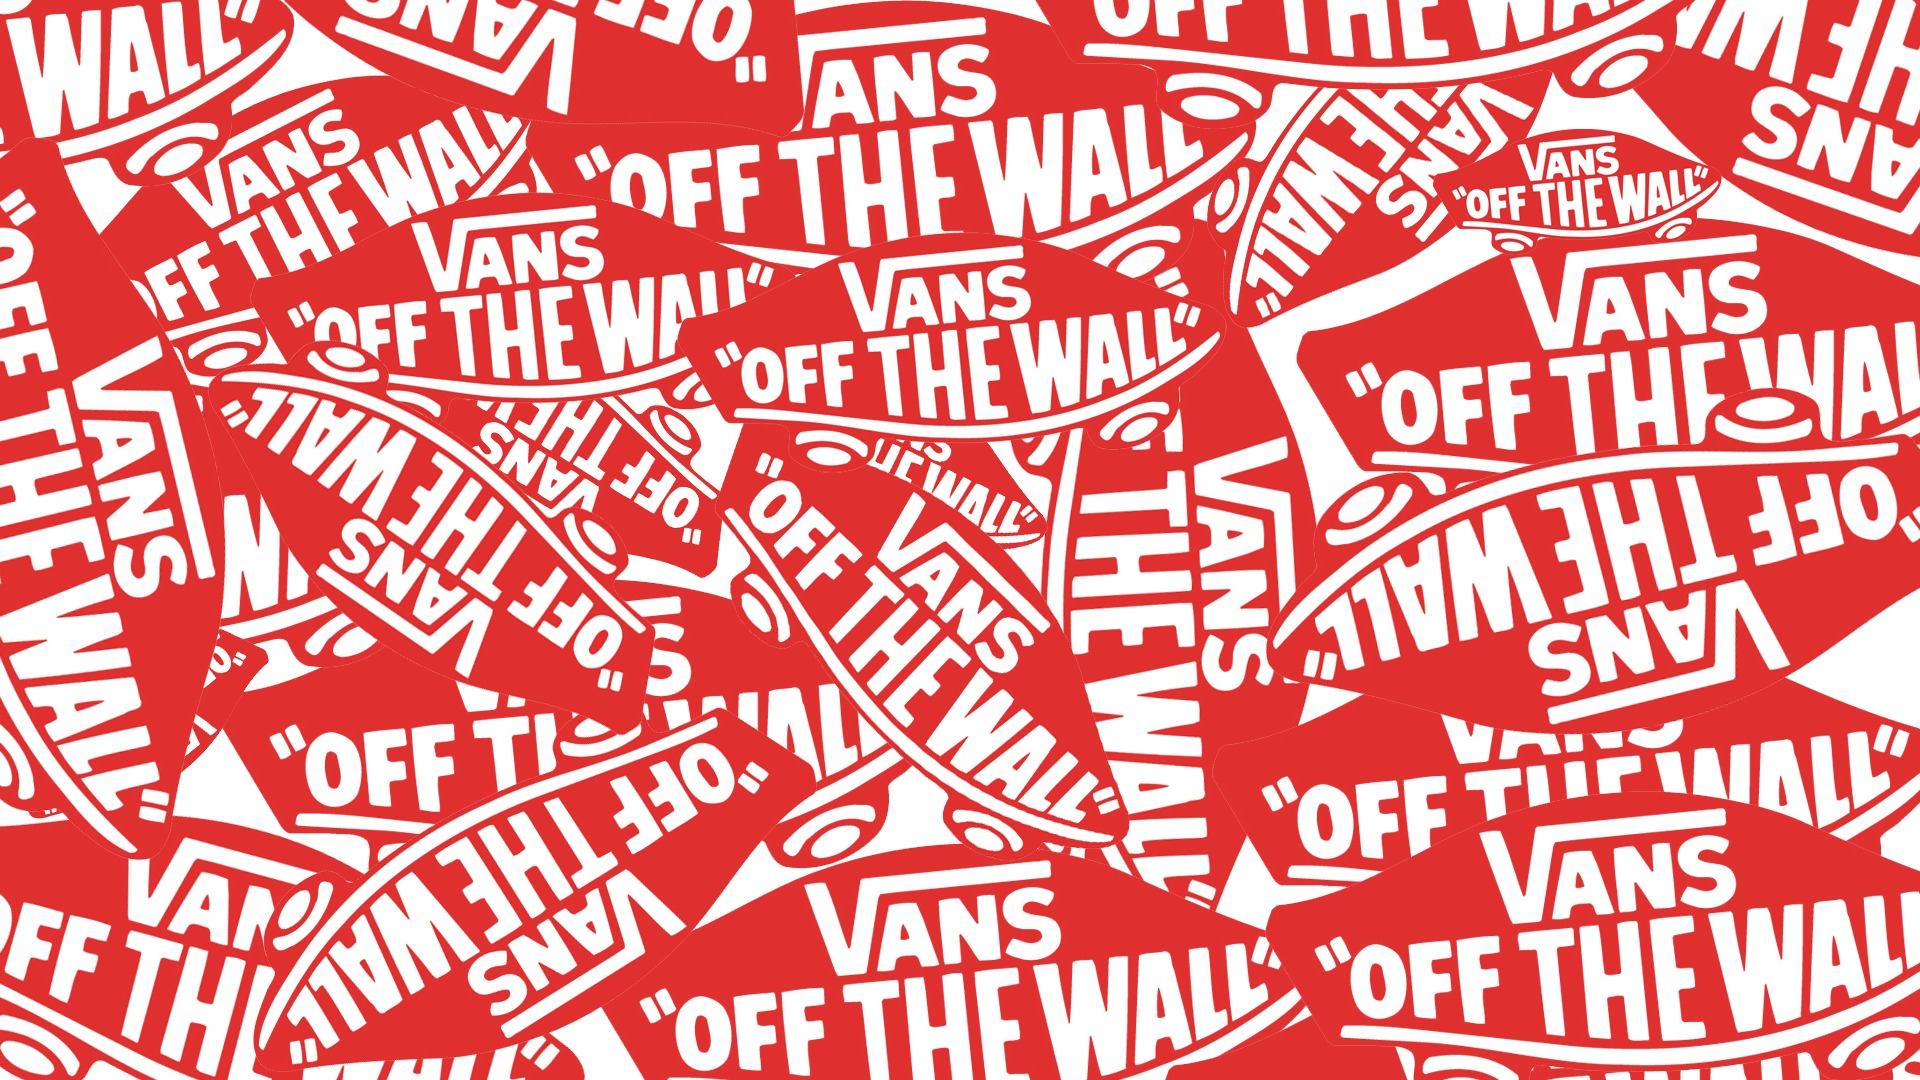 Wallpaper Vans Skate Vance Wallpapers Style Download